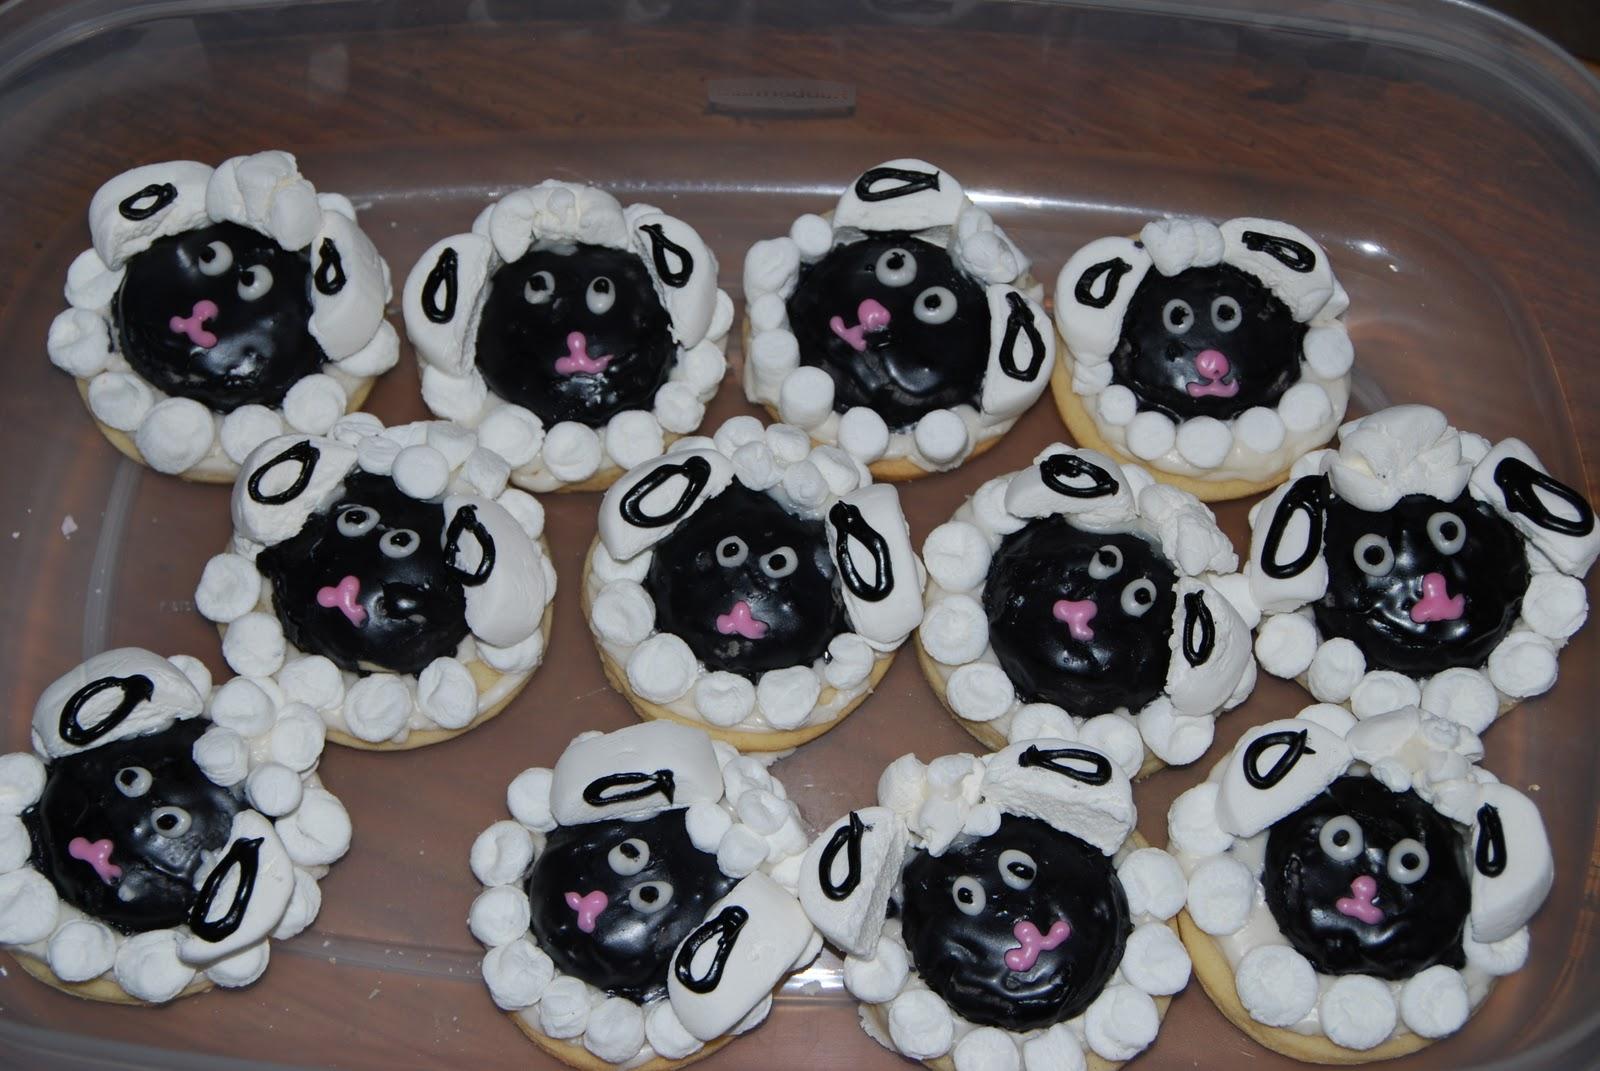 Life S A Bowl Of Cherries Baa Baa Black Sheep Have You